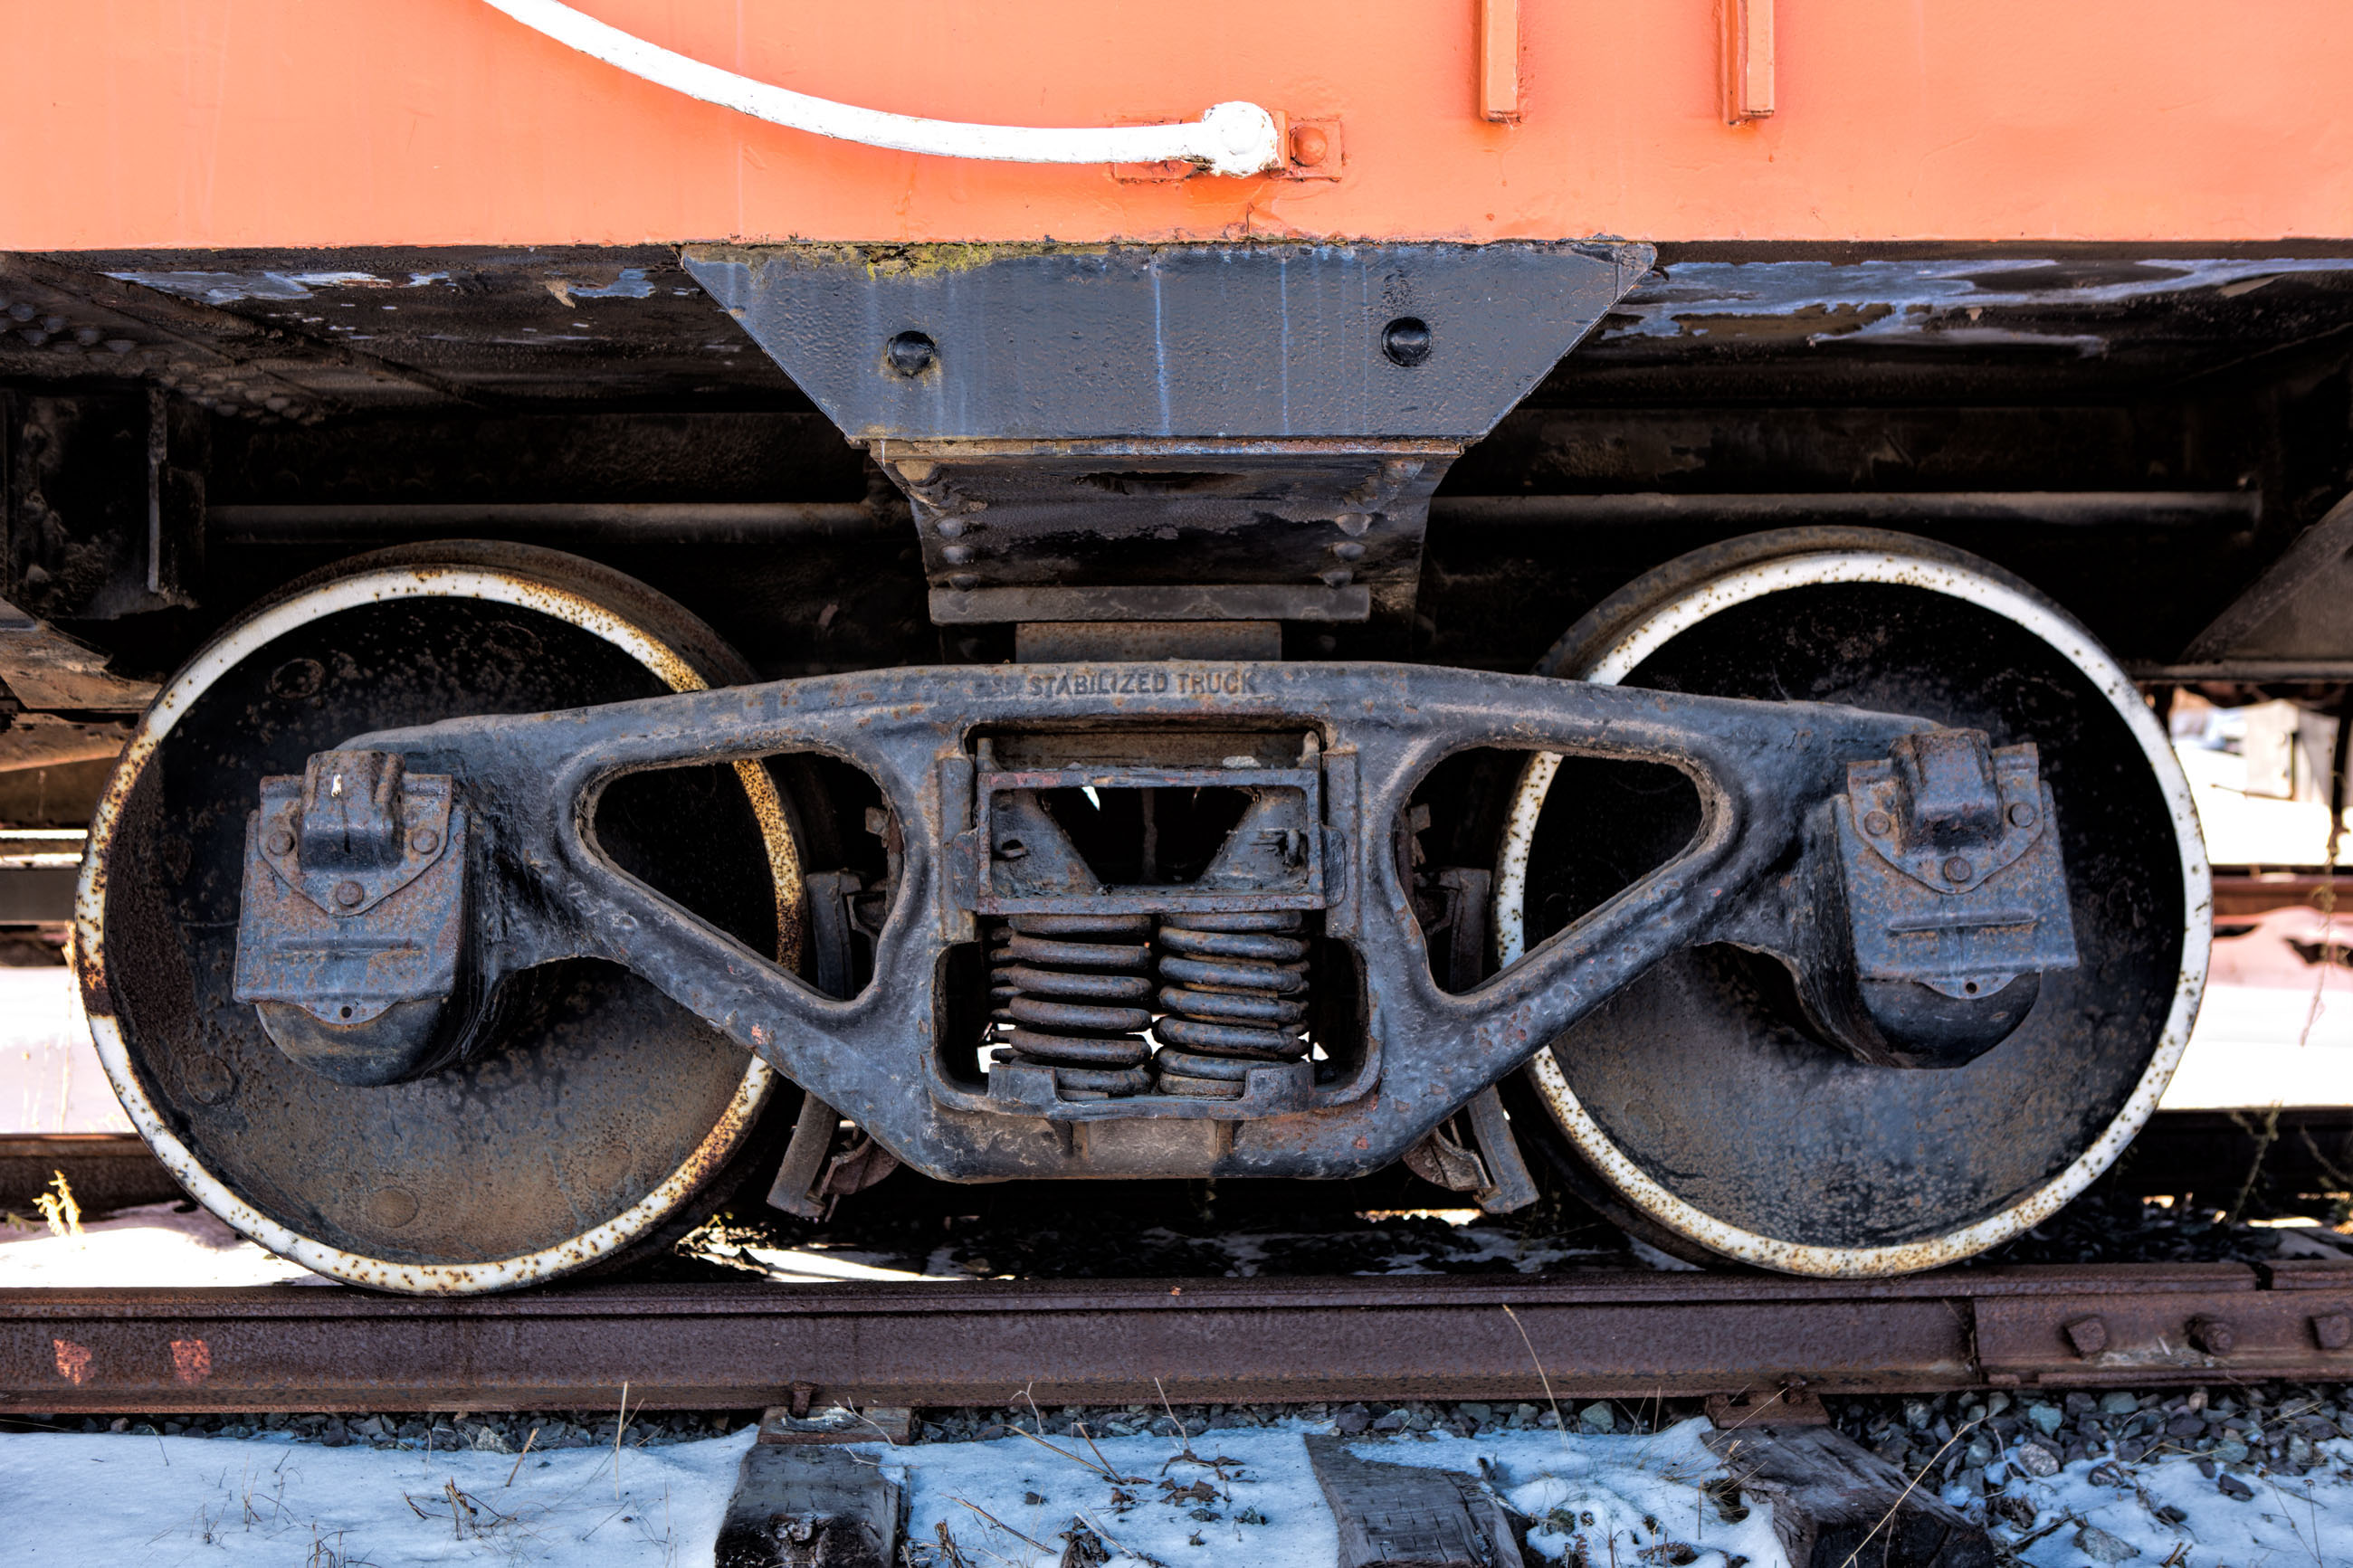 Train Wheel, Brake, Rail, Travel, Transportation, HQ Photo